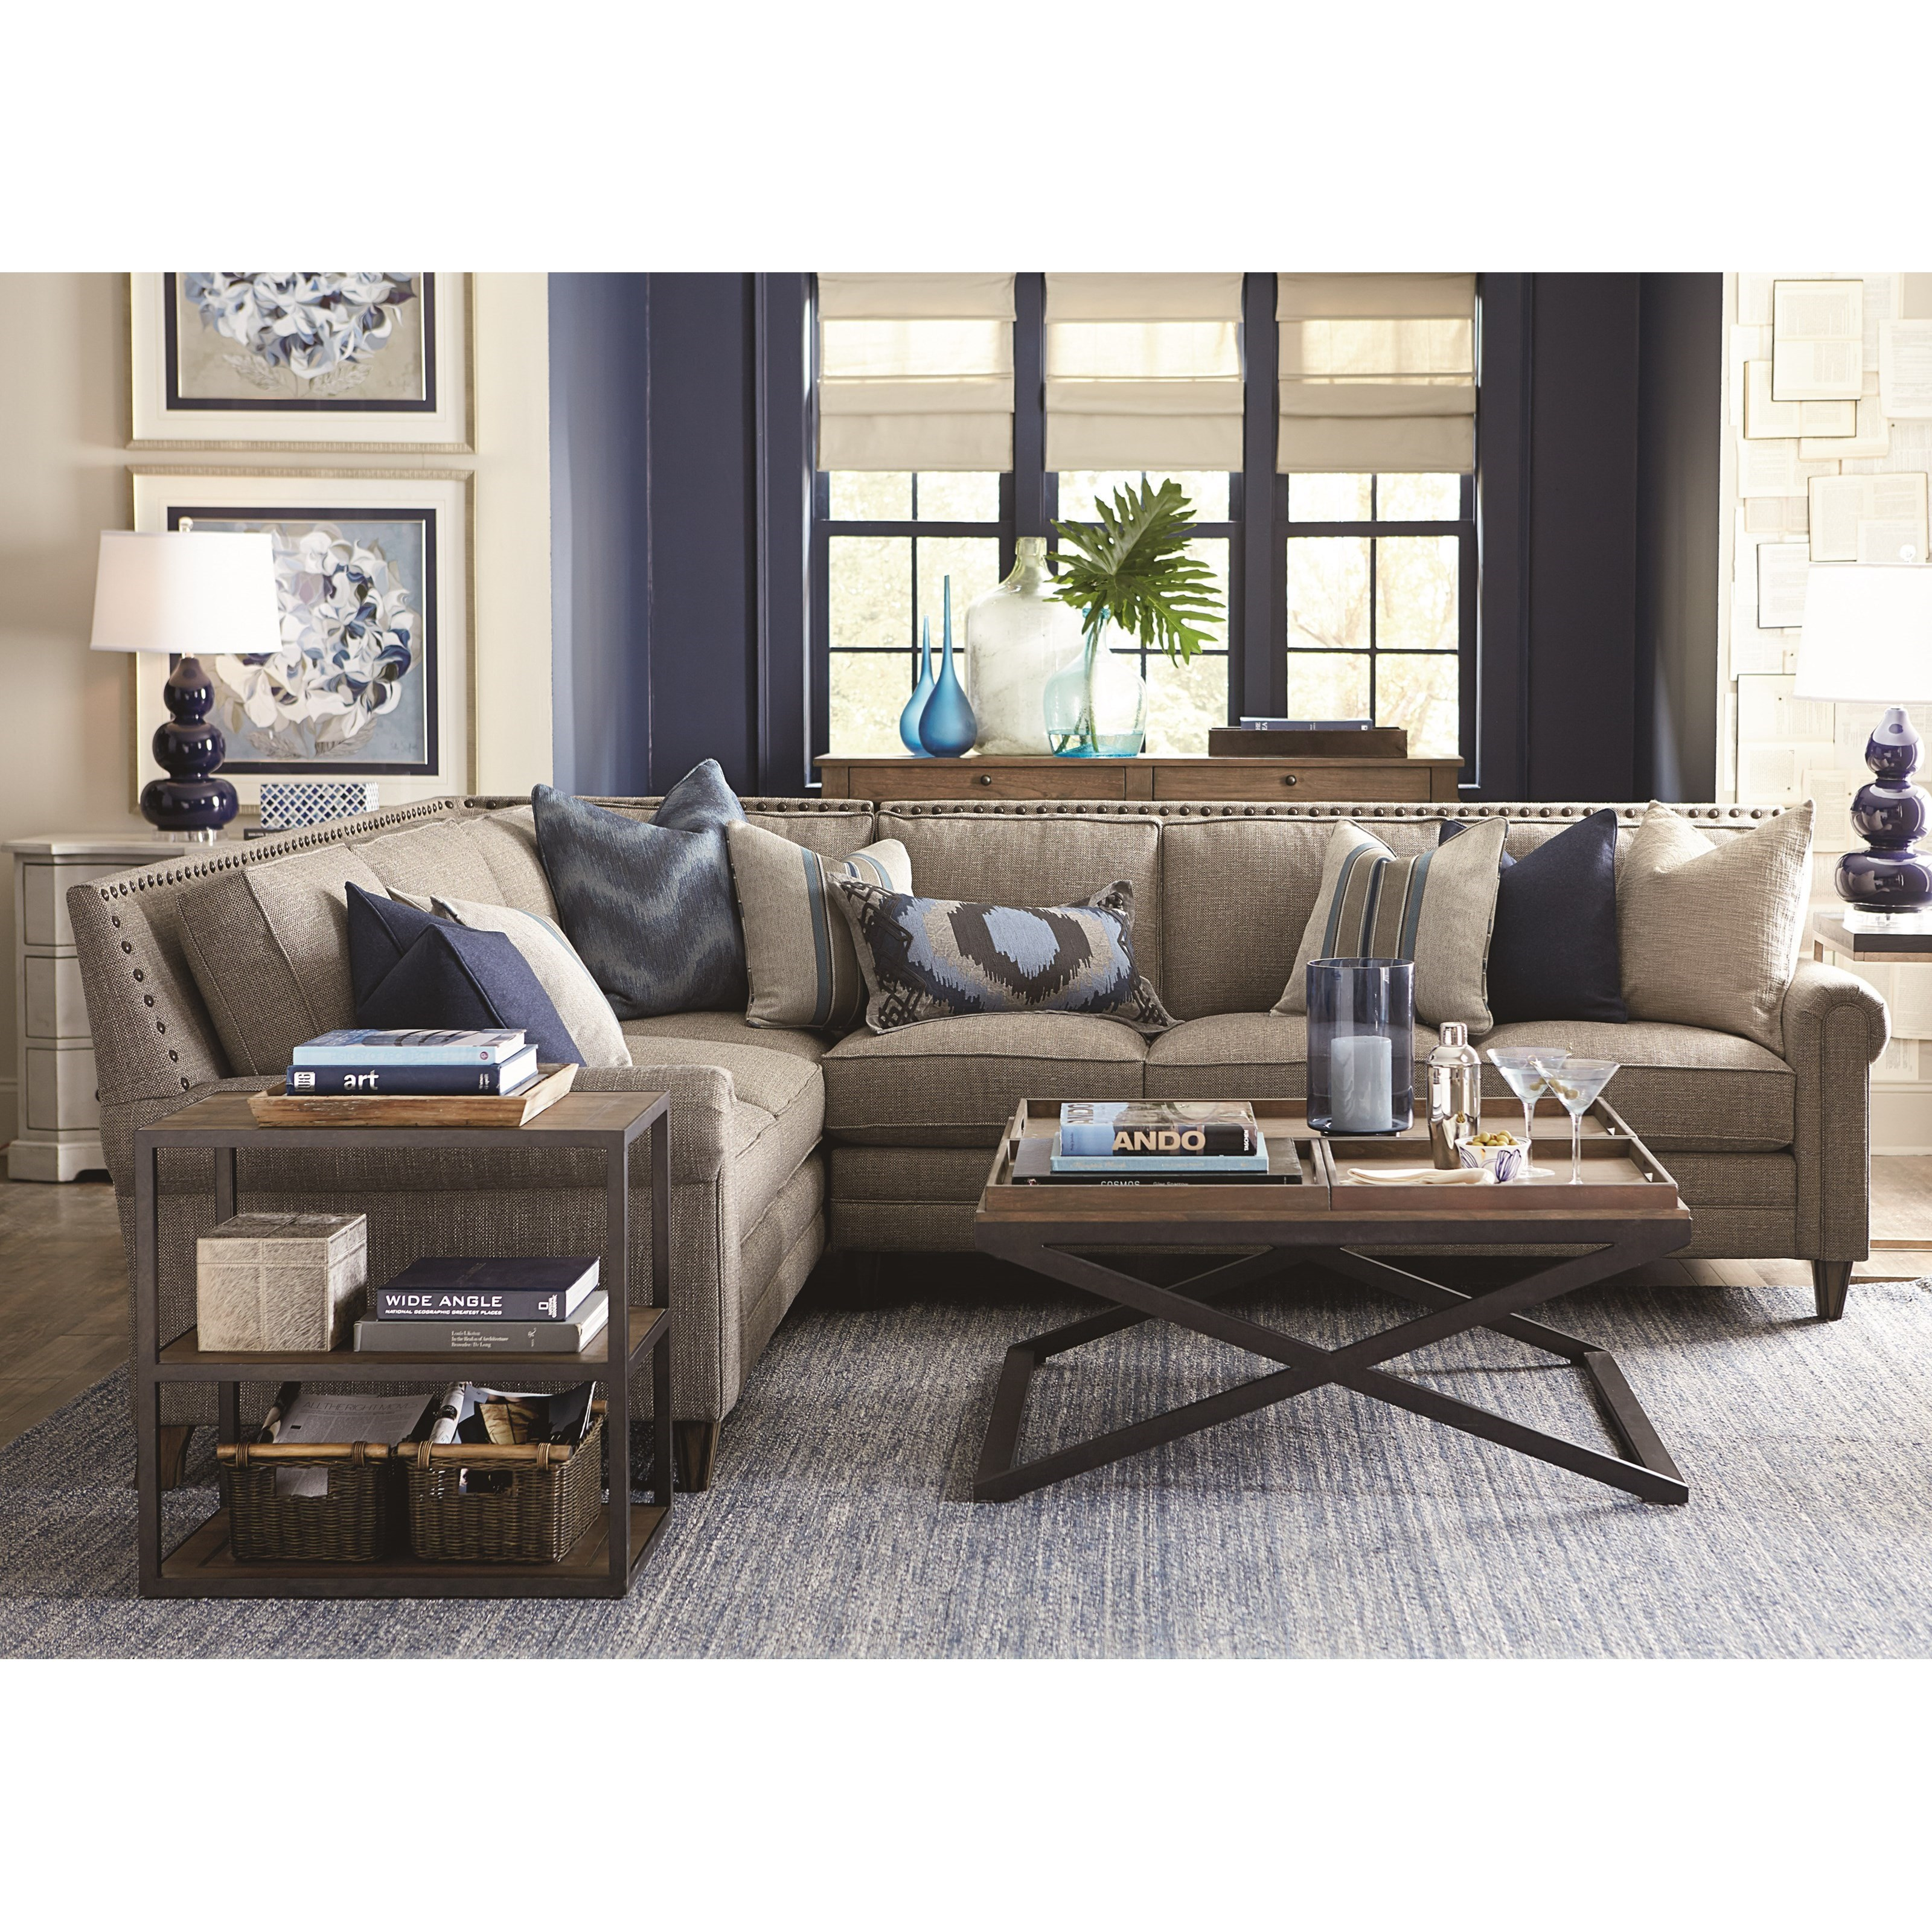 Bassett Harlan Sectional Sofa With 5 Seats